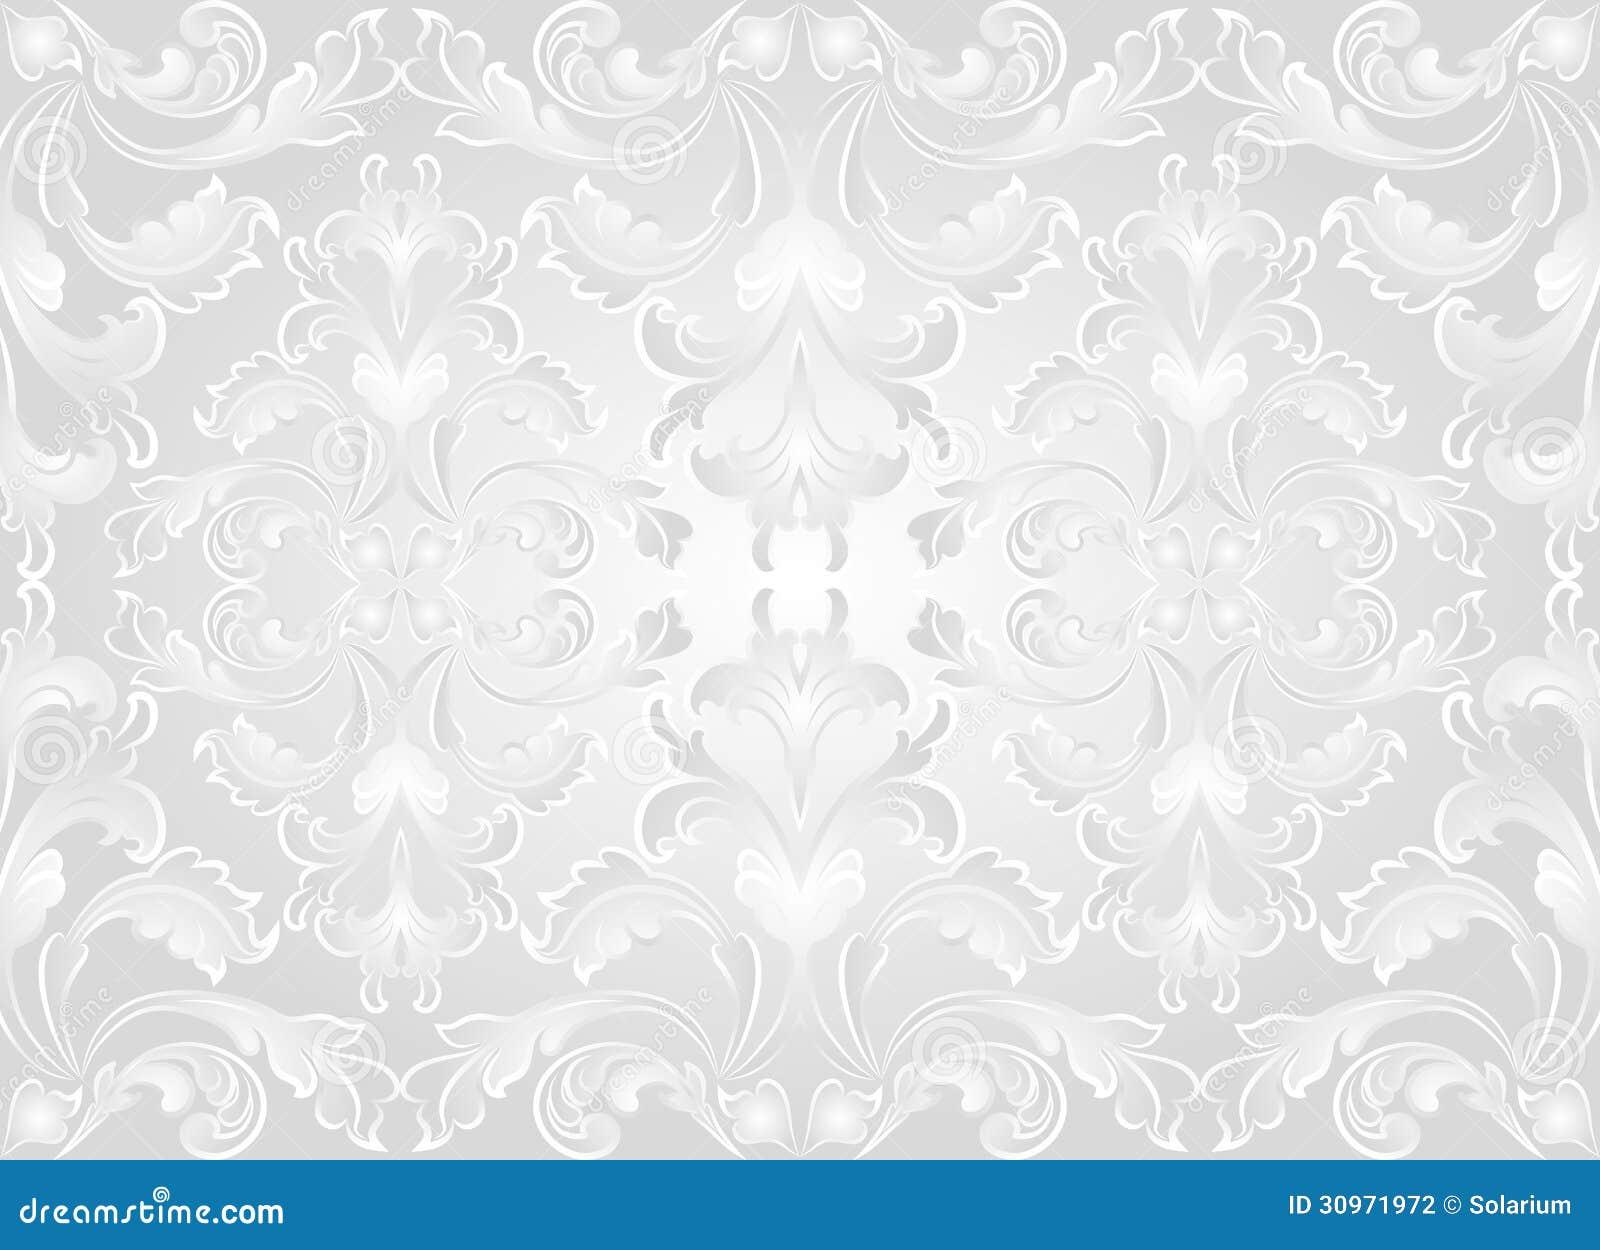 Fondo blanco ilustraci n del vector ilustraci n de for Fondo blanco wallpaper